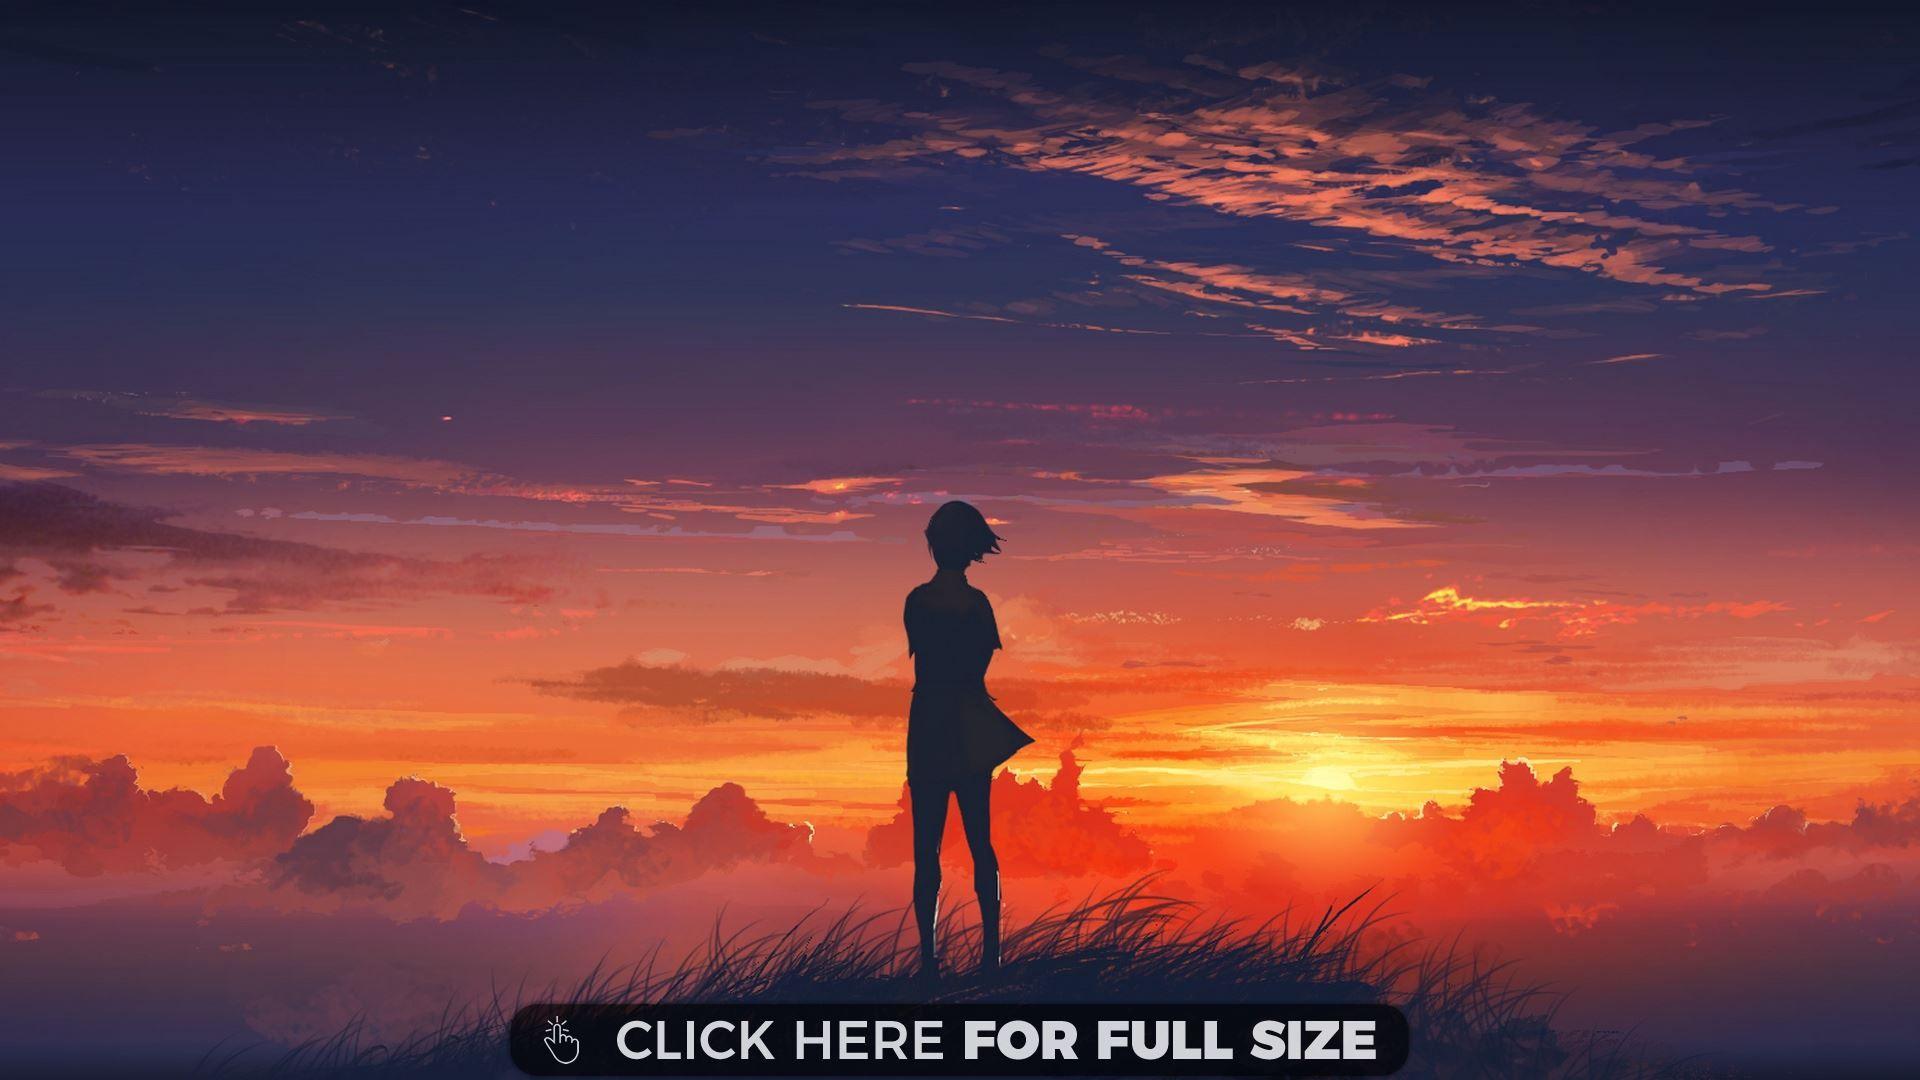 Sunset View Anime wallpaper Anime scenery wallpaper Anime 1920x1080